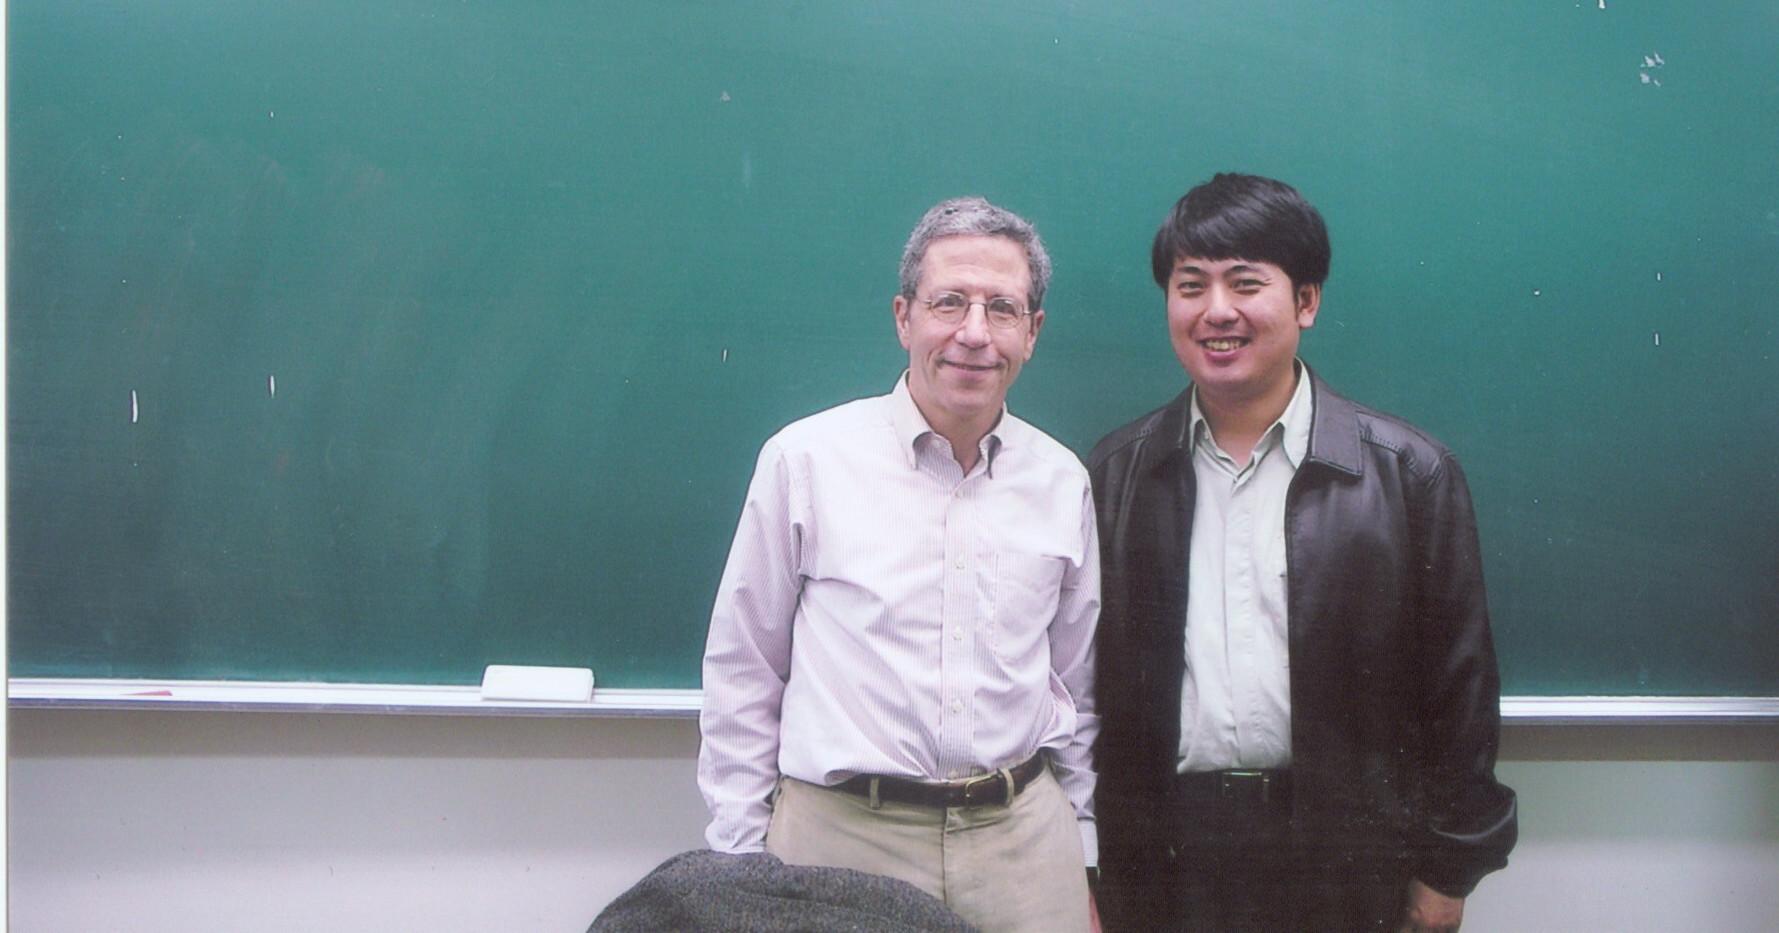 Professor Maskin 2007